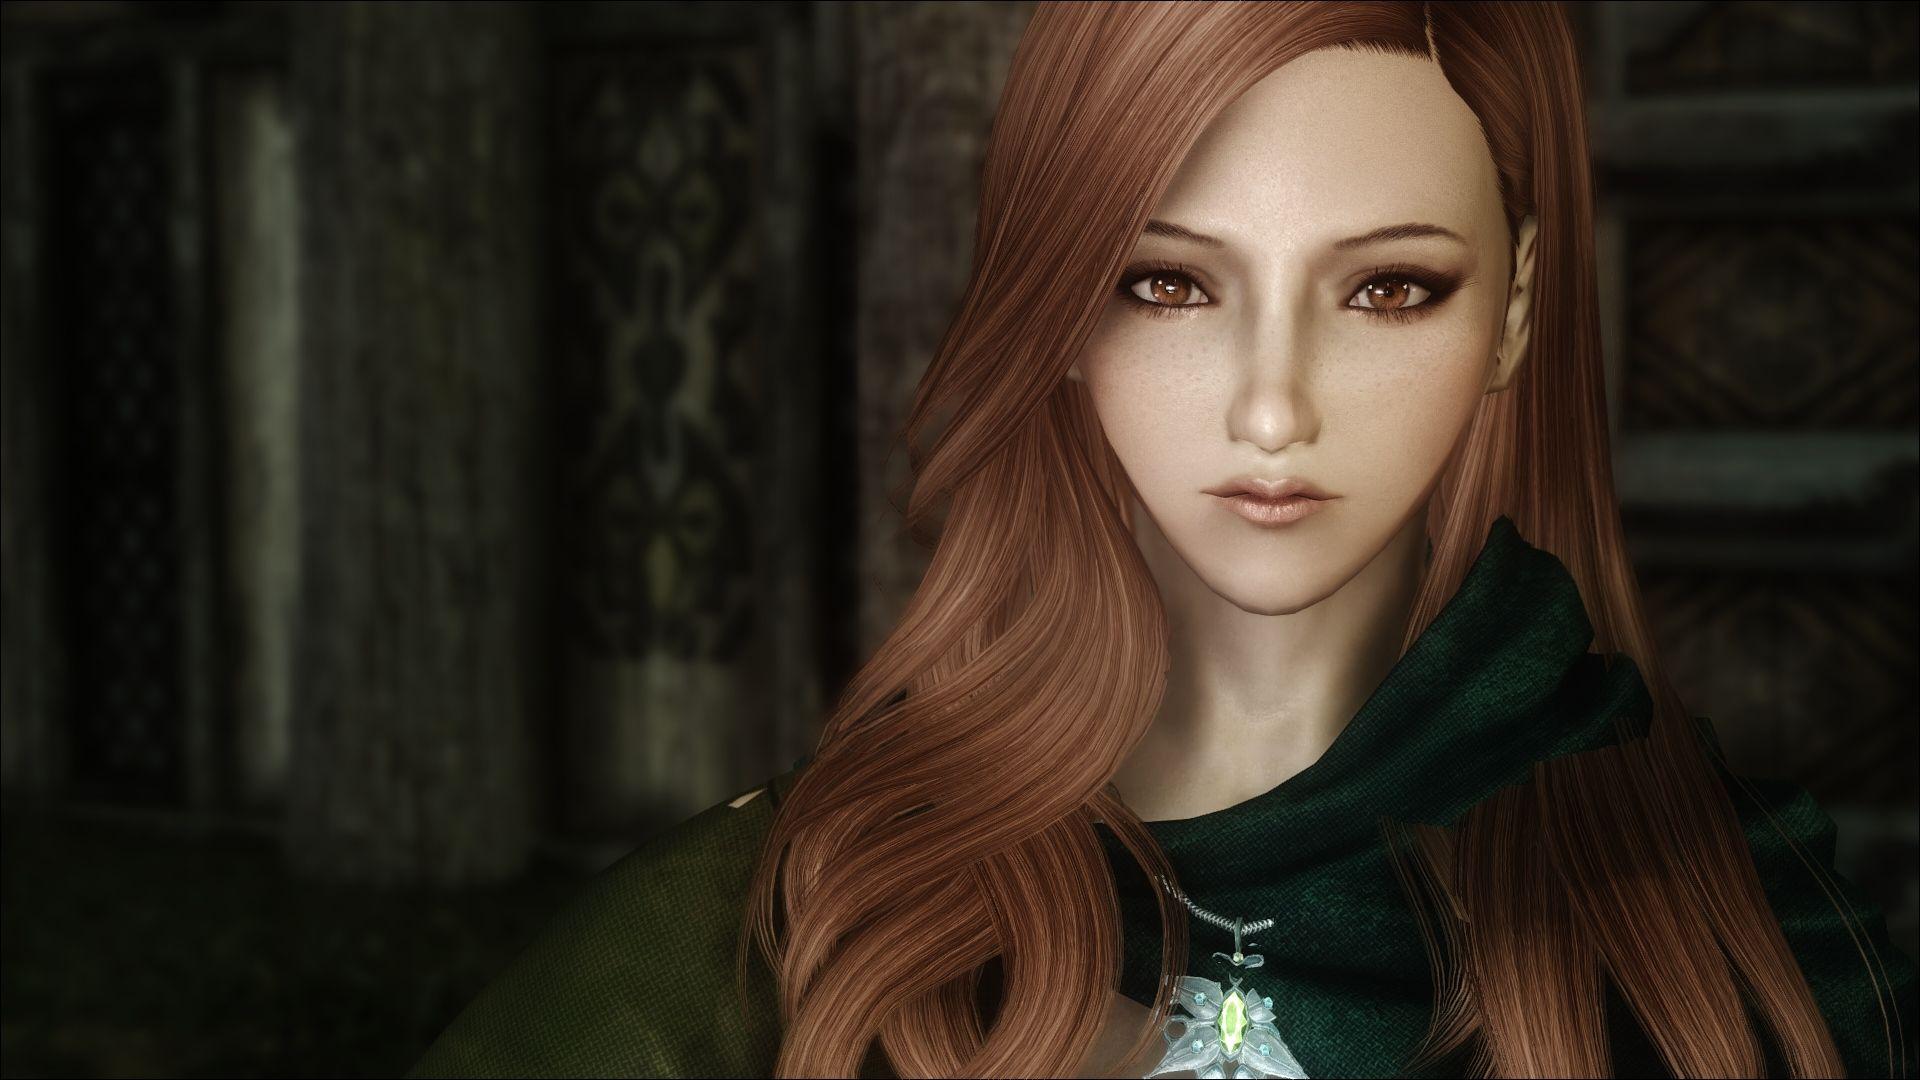 Pin By Mayhem 7 Inc On Super Cool Blogs Elder Scrolls